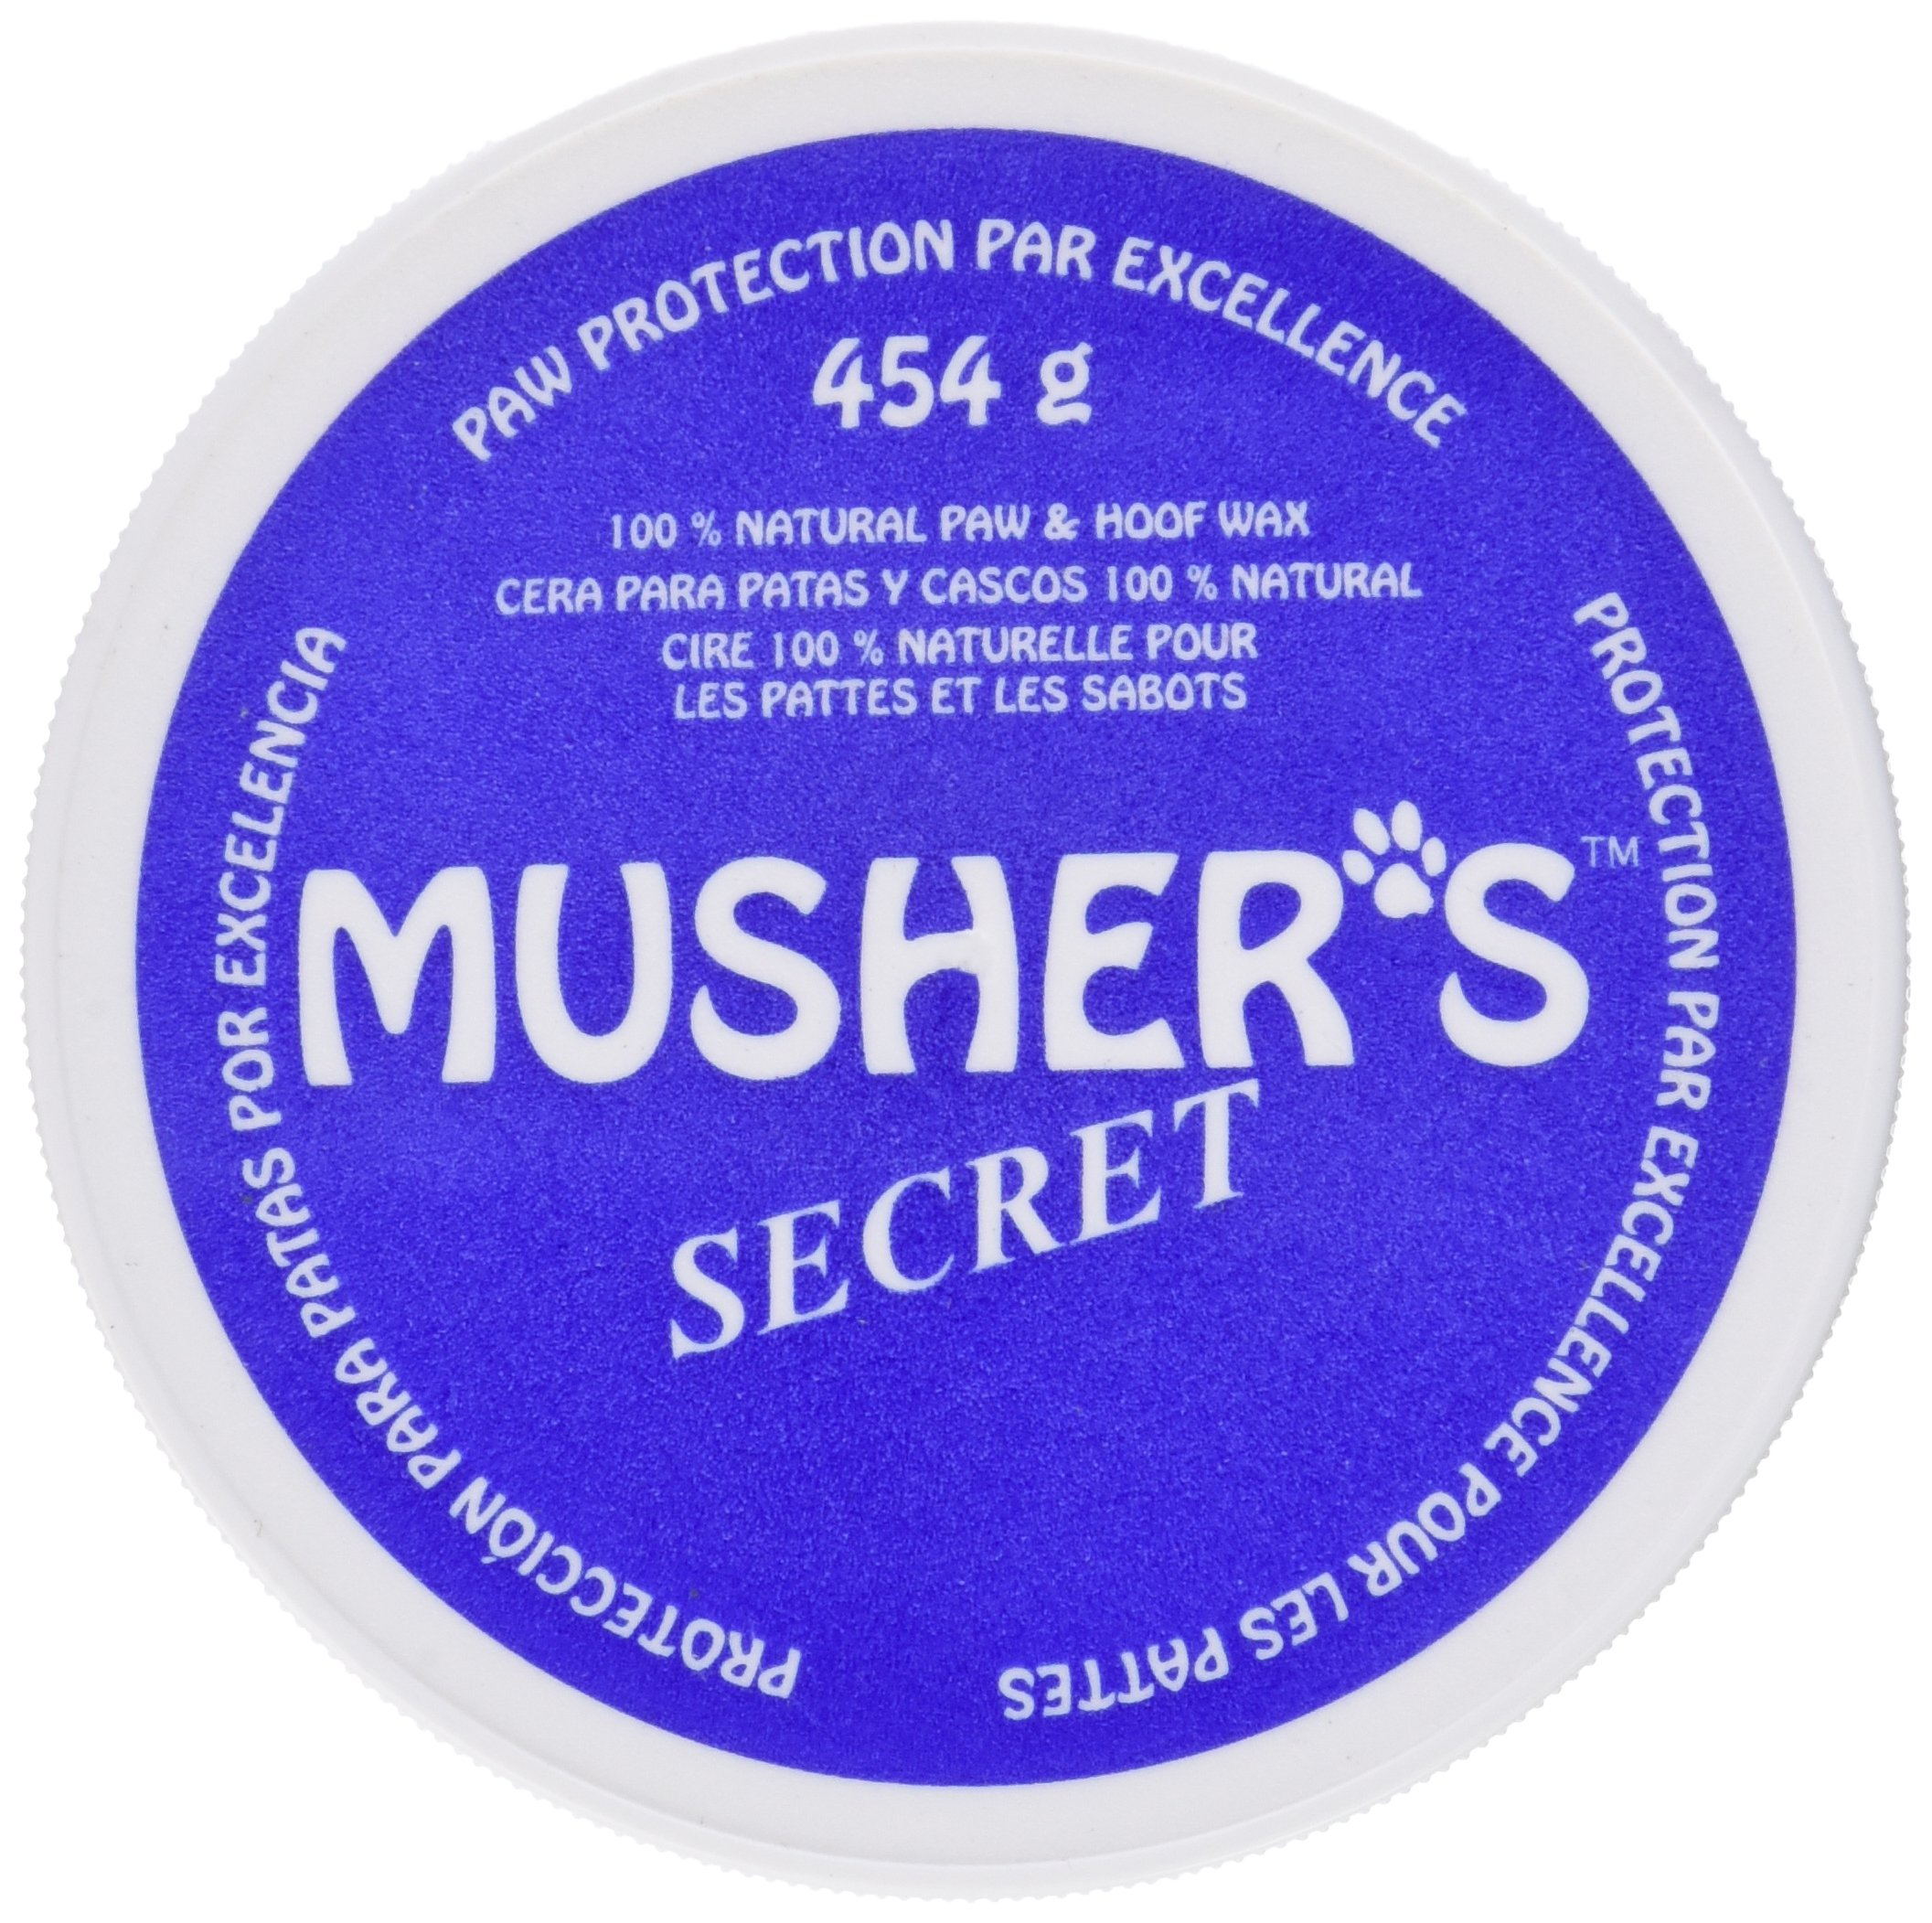 Musher's Secret Pet Paw Protection Wax, 1-Pound by Mushers